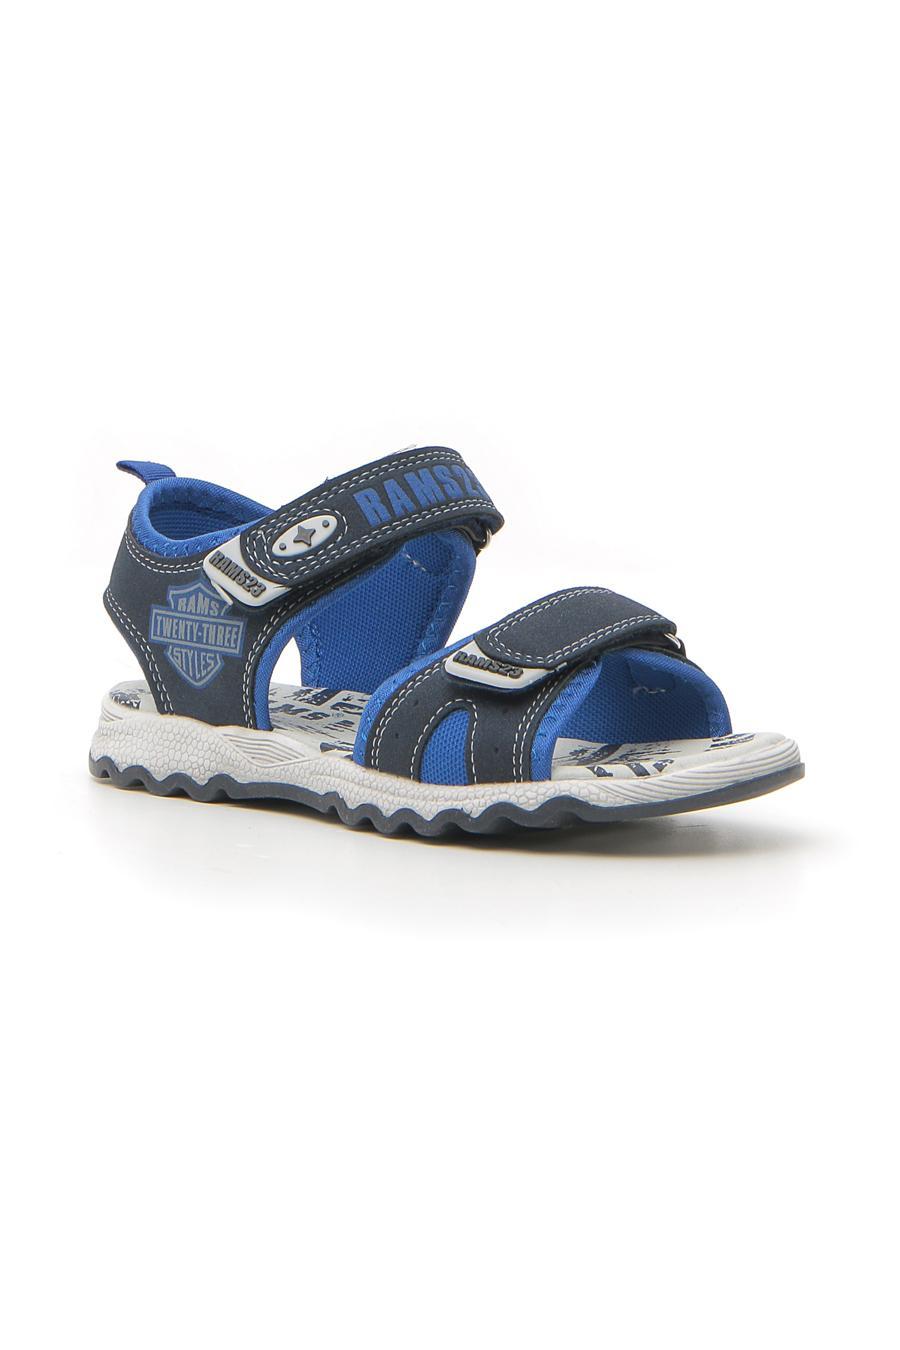 SANDALI bambino blu RAMS23 2705 | Pittarello